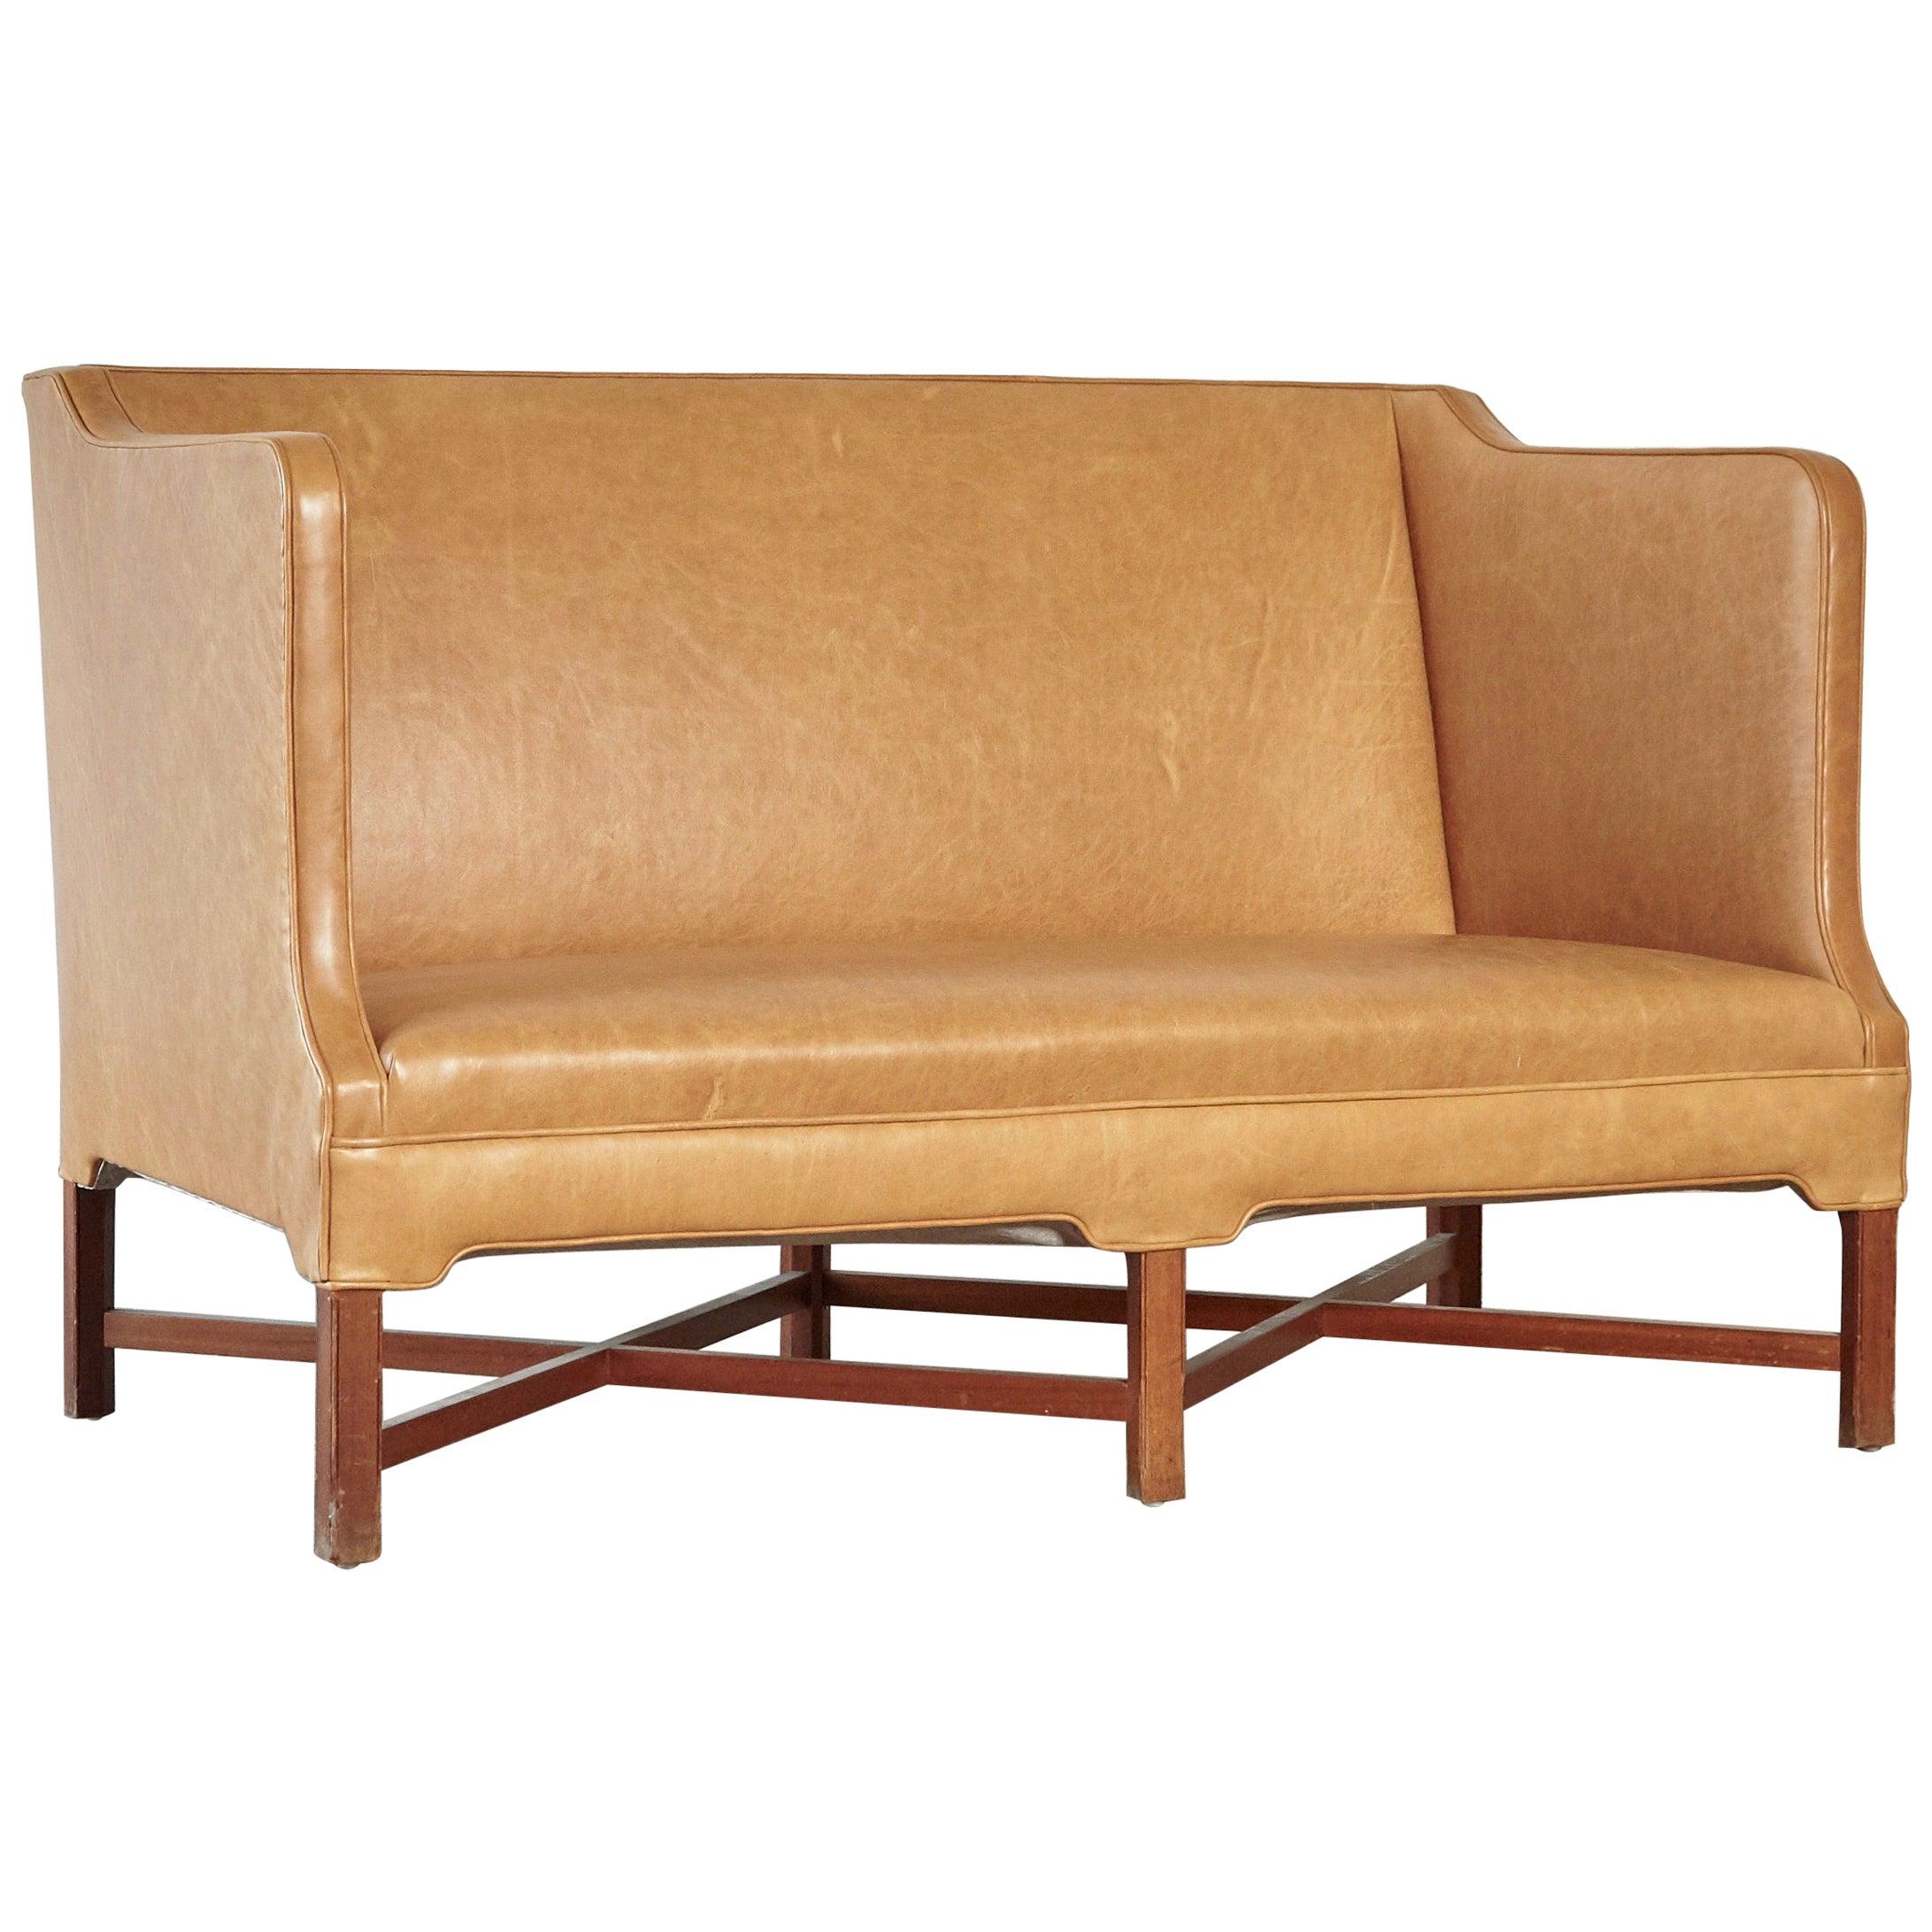 Kaare Klint Model 4118 Box Sofa, Rud Rasmussen, Denmark, 1950s